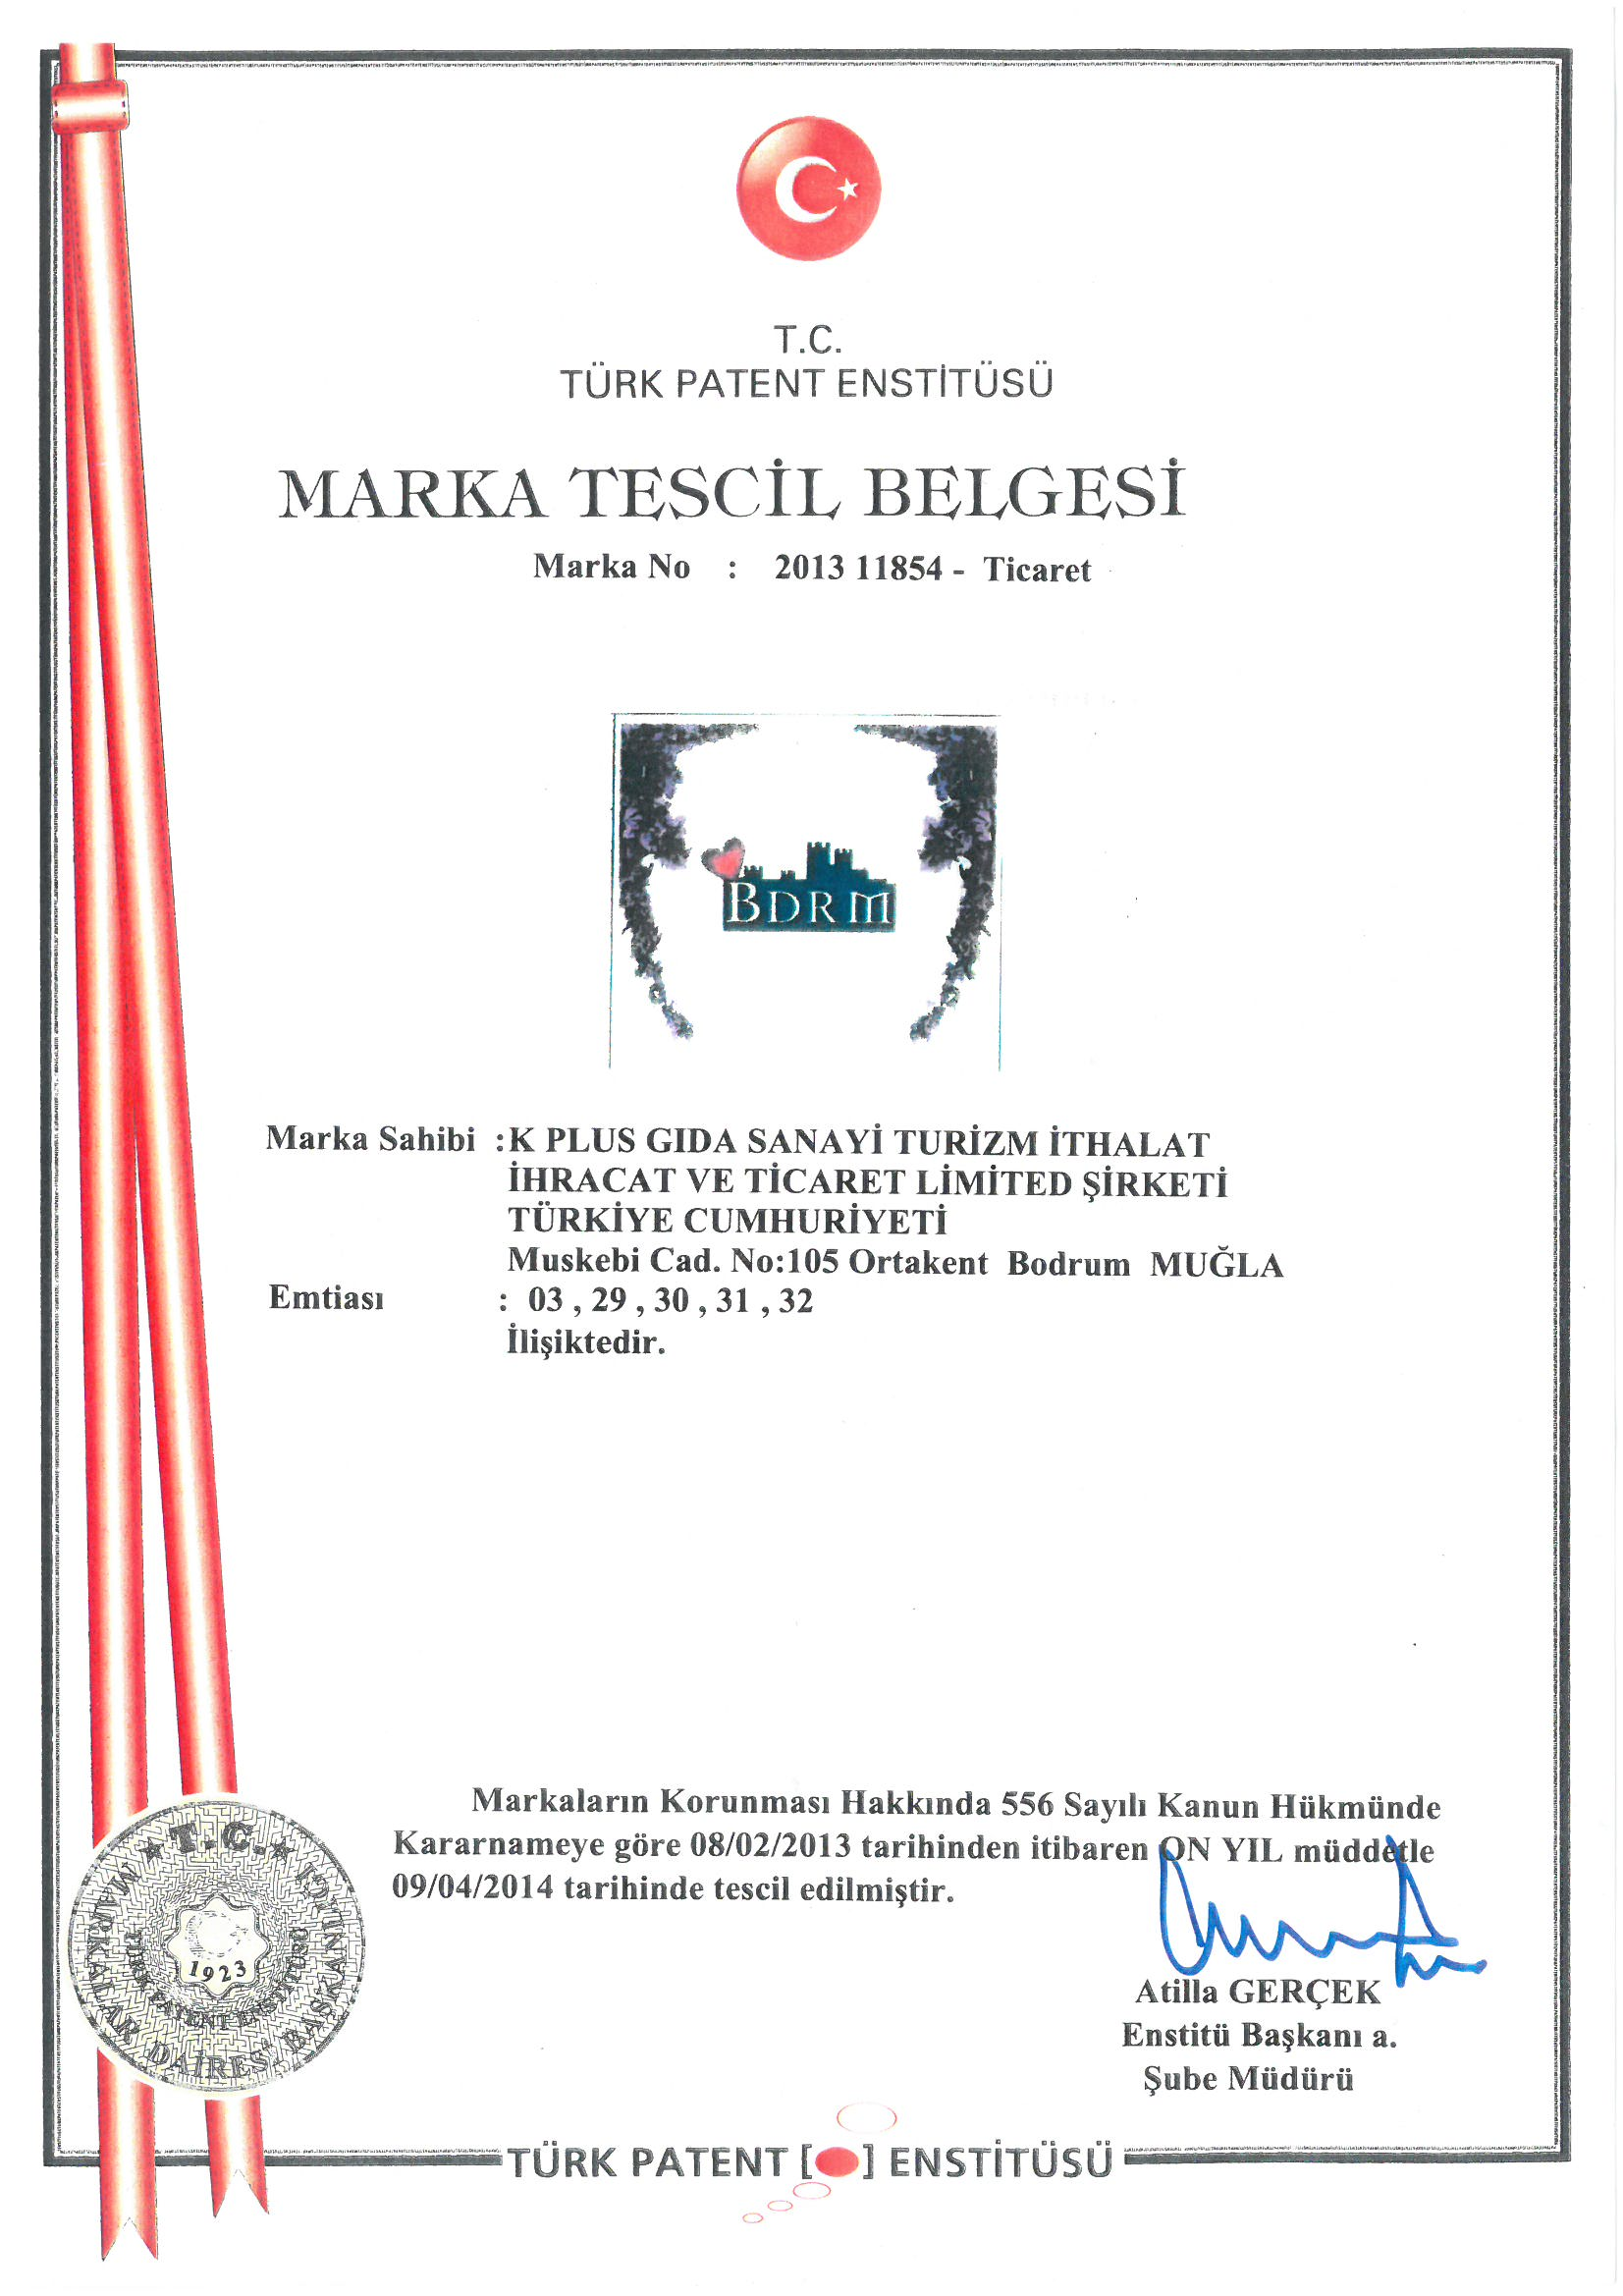 BDRM Lokum Marka Tescil